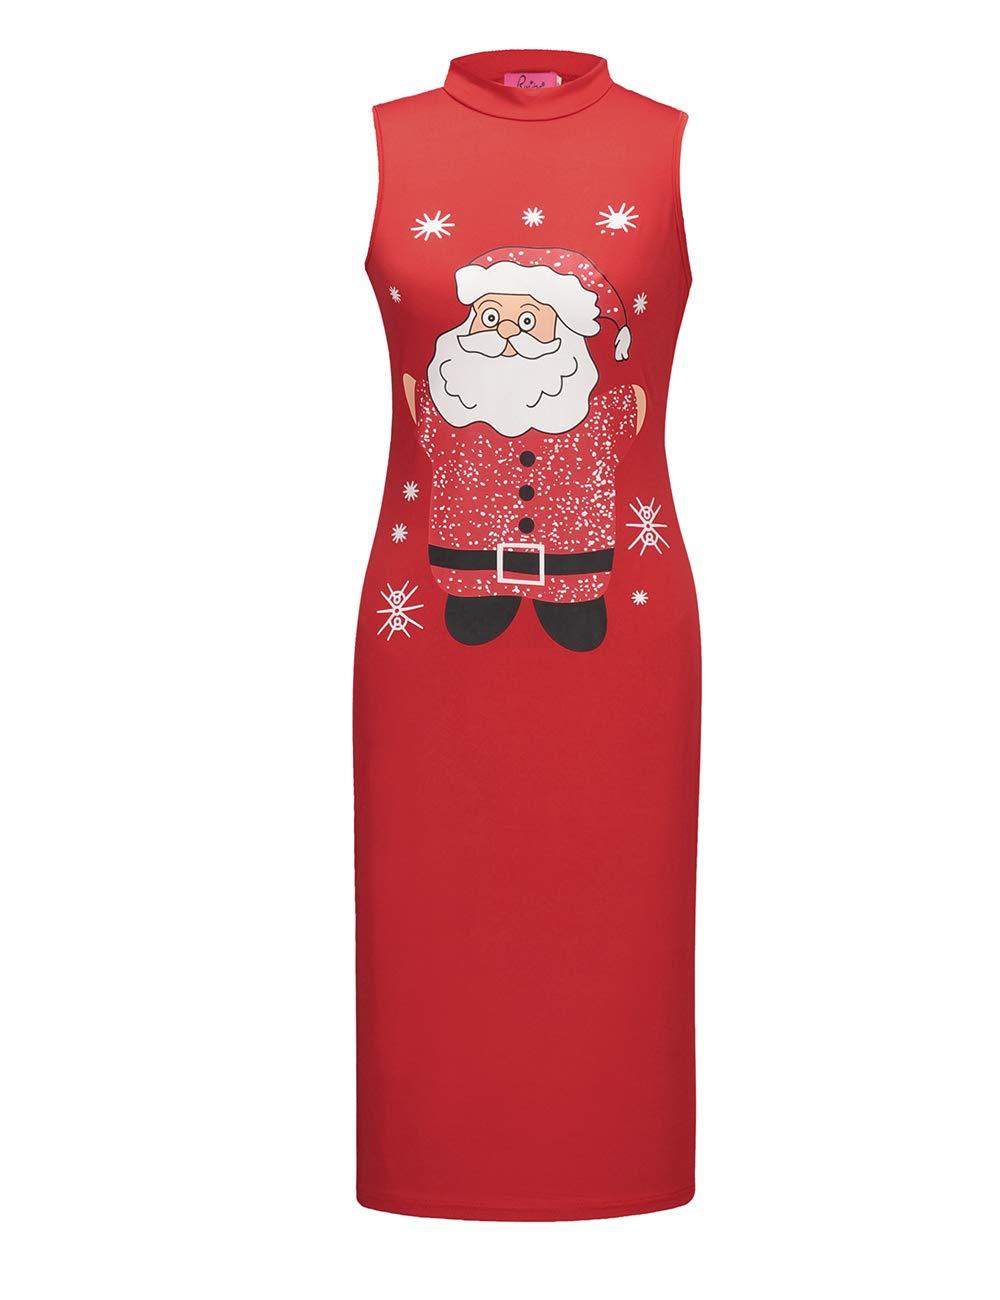 Ruiyige Womens Sleeveless Christmas Printed Loose Fit Mini Dress,#L1027 Red Santa Claus XX-Large…